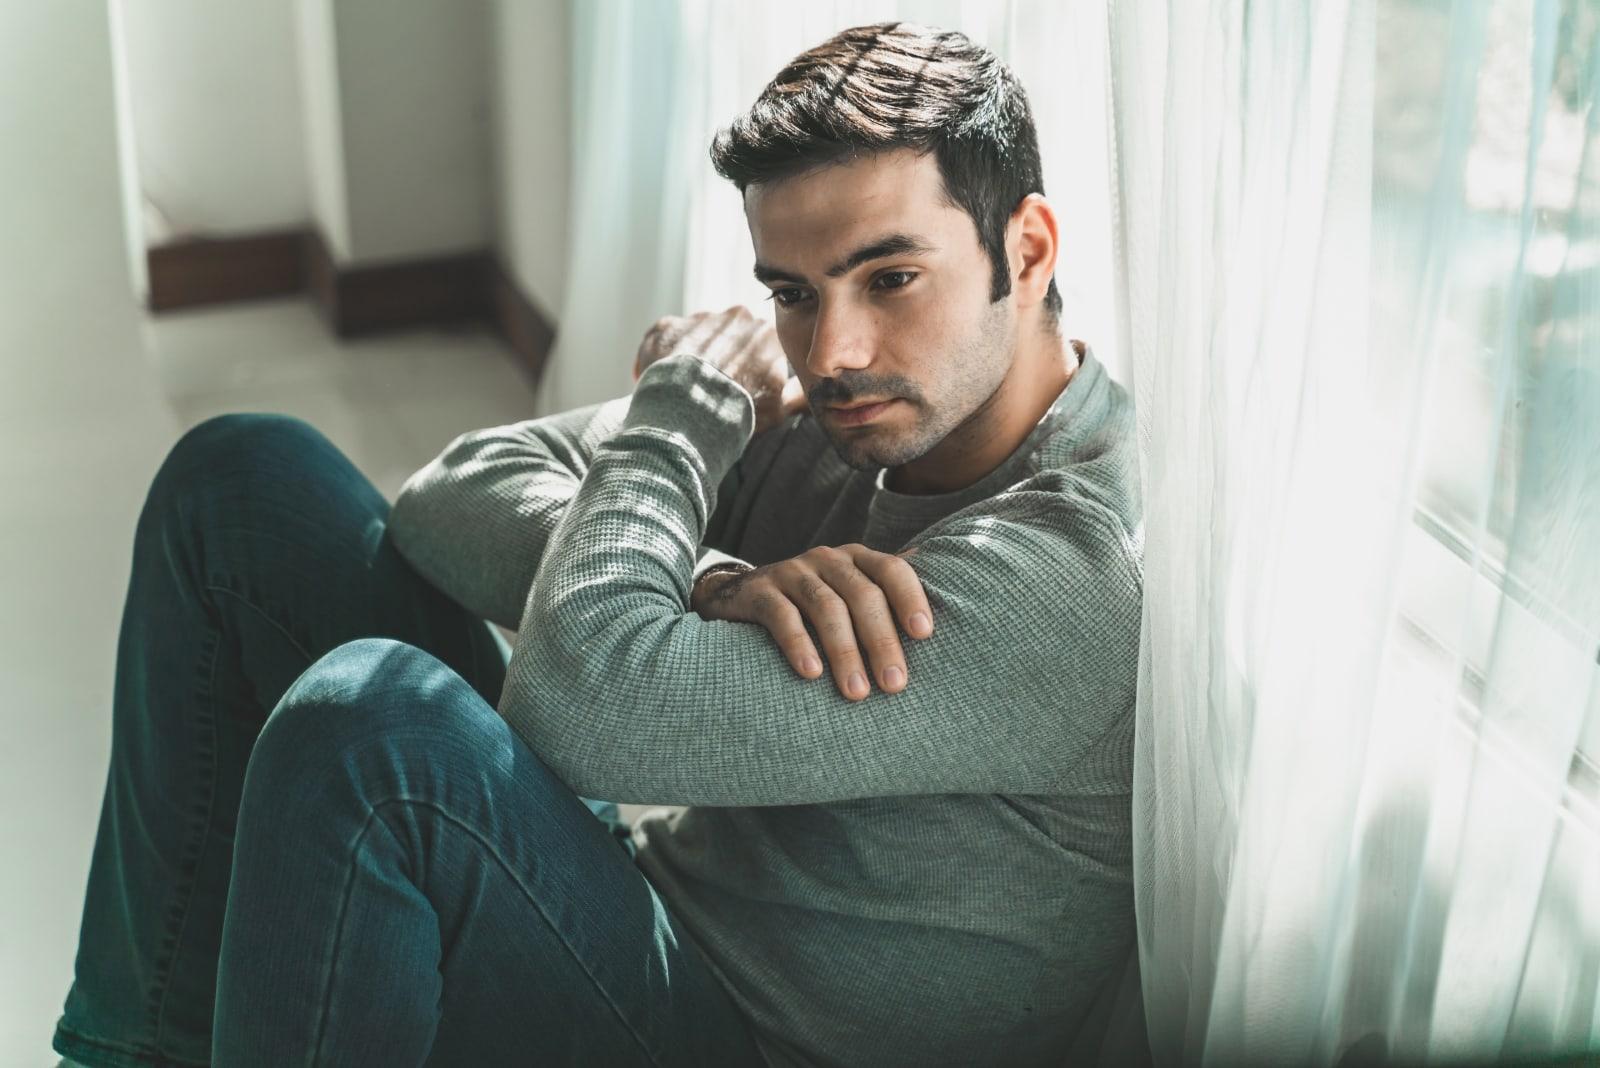 sad man in gray top sitting on floor thinking